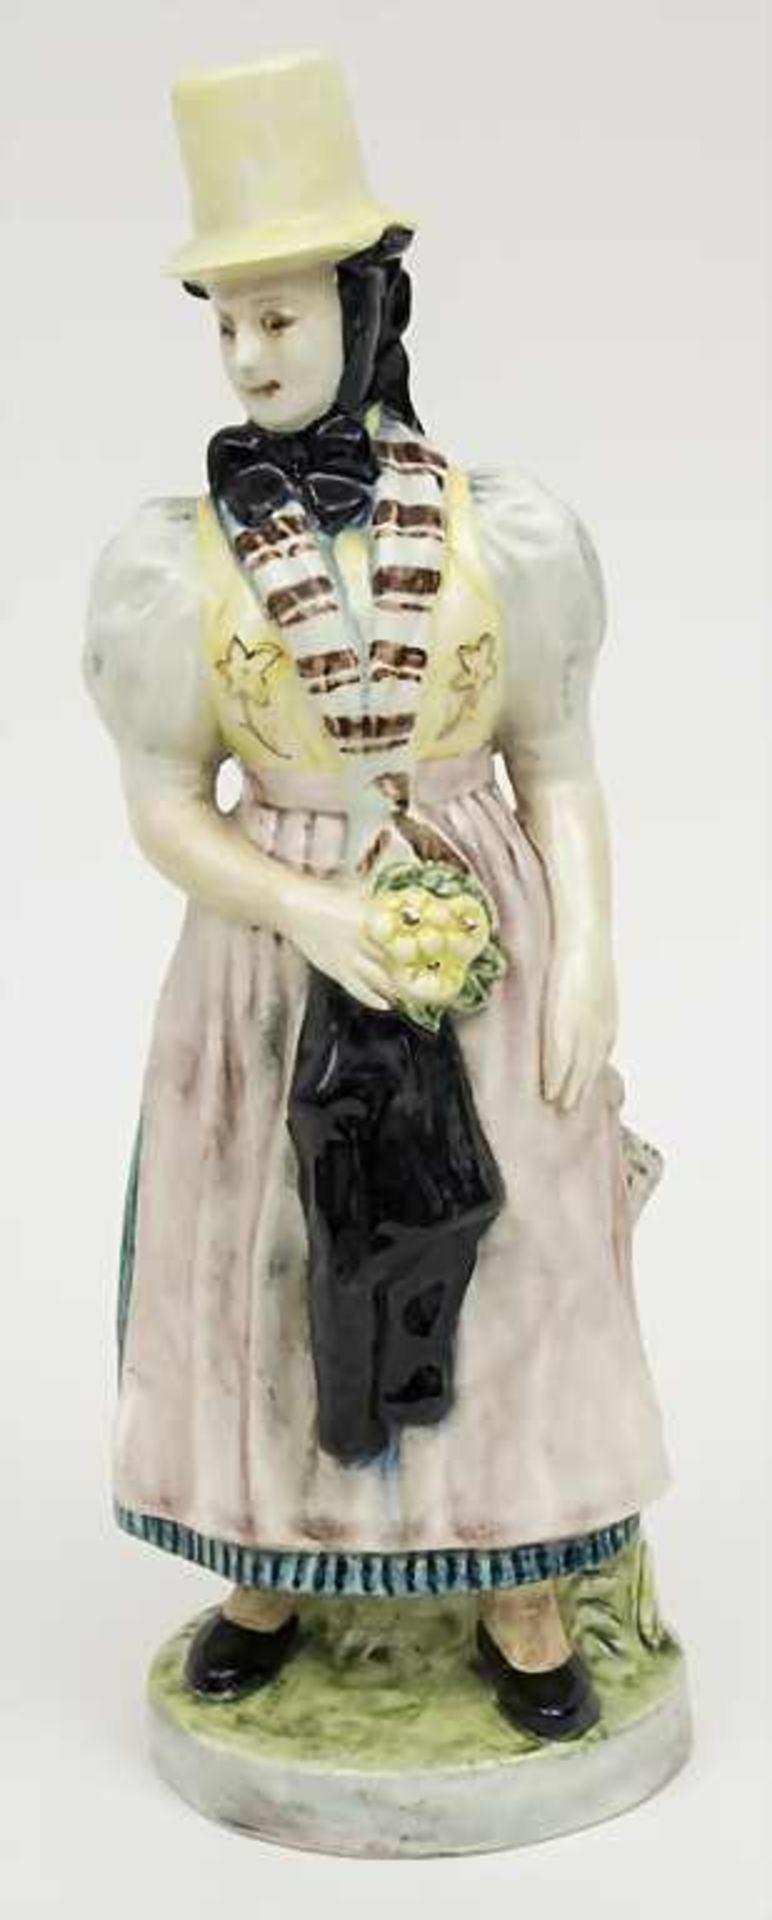 Trachtenfigur 'Tribergerin' / A costumed woman from Triberg, Karlsruher Majolika, um 1950